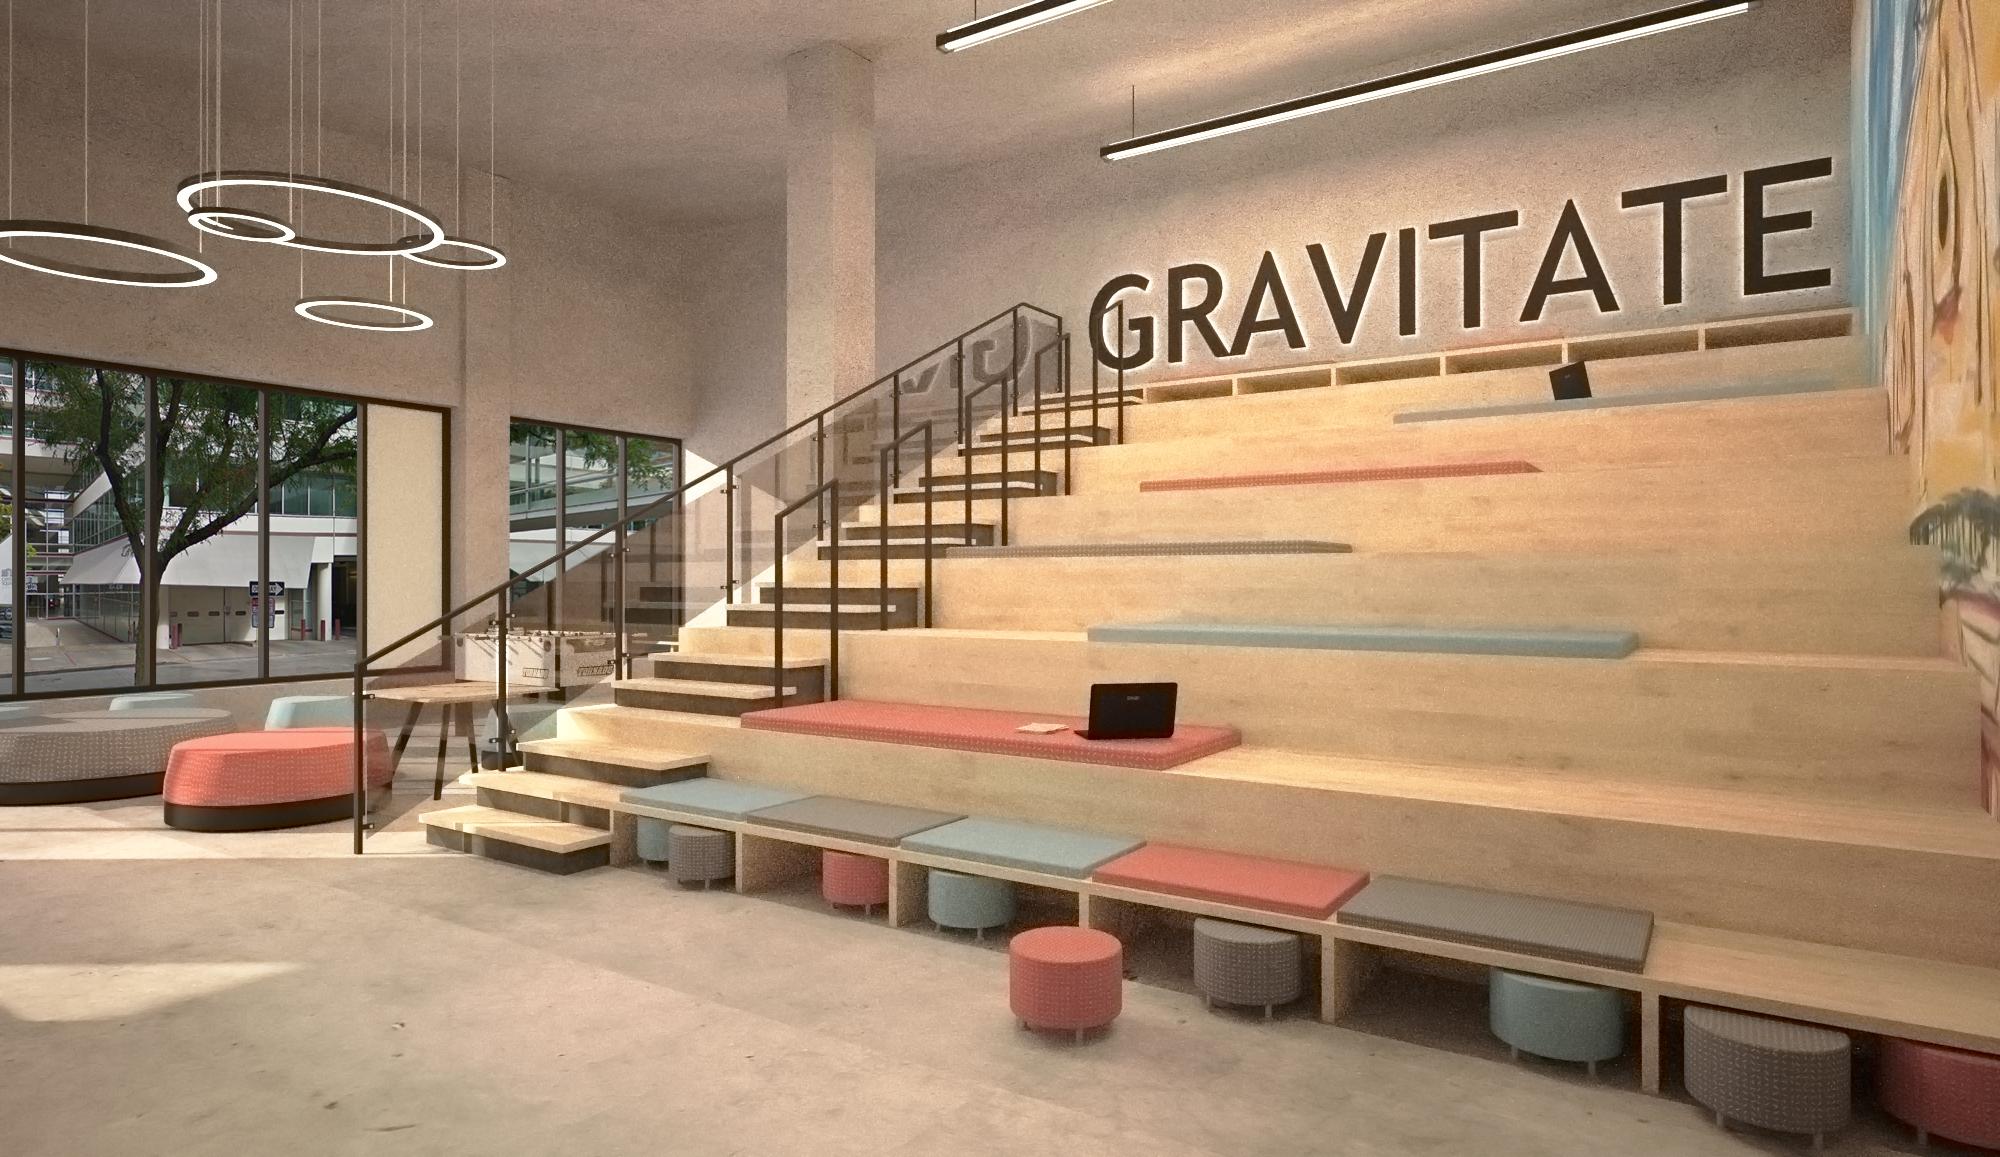 6f9df-gravitate2-0stairitoriumstairitorium.jpg